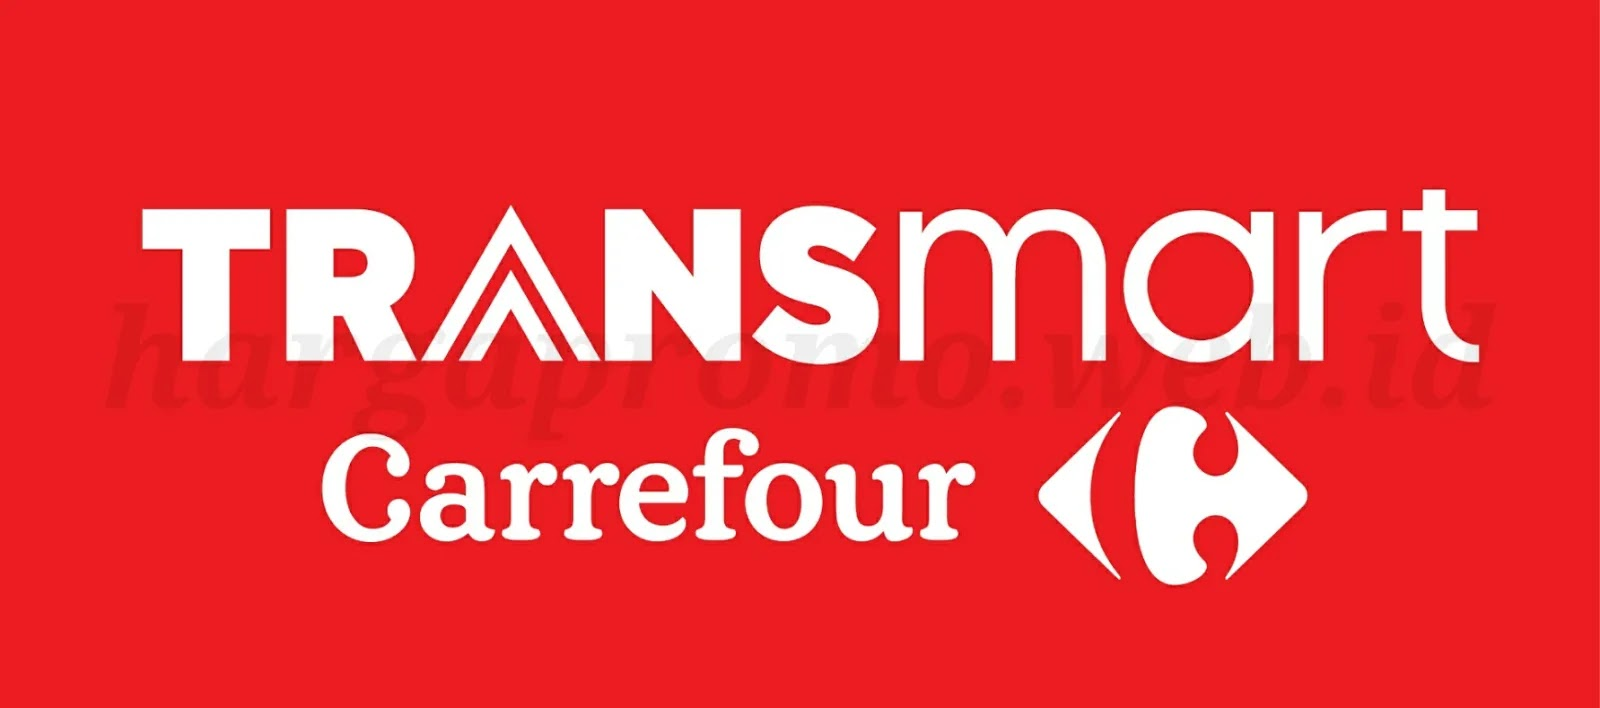 Promo Elektronik - Transmart Carrefour